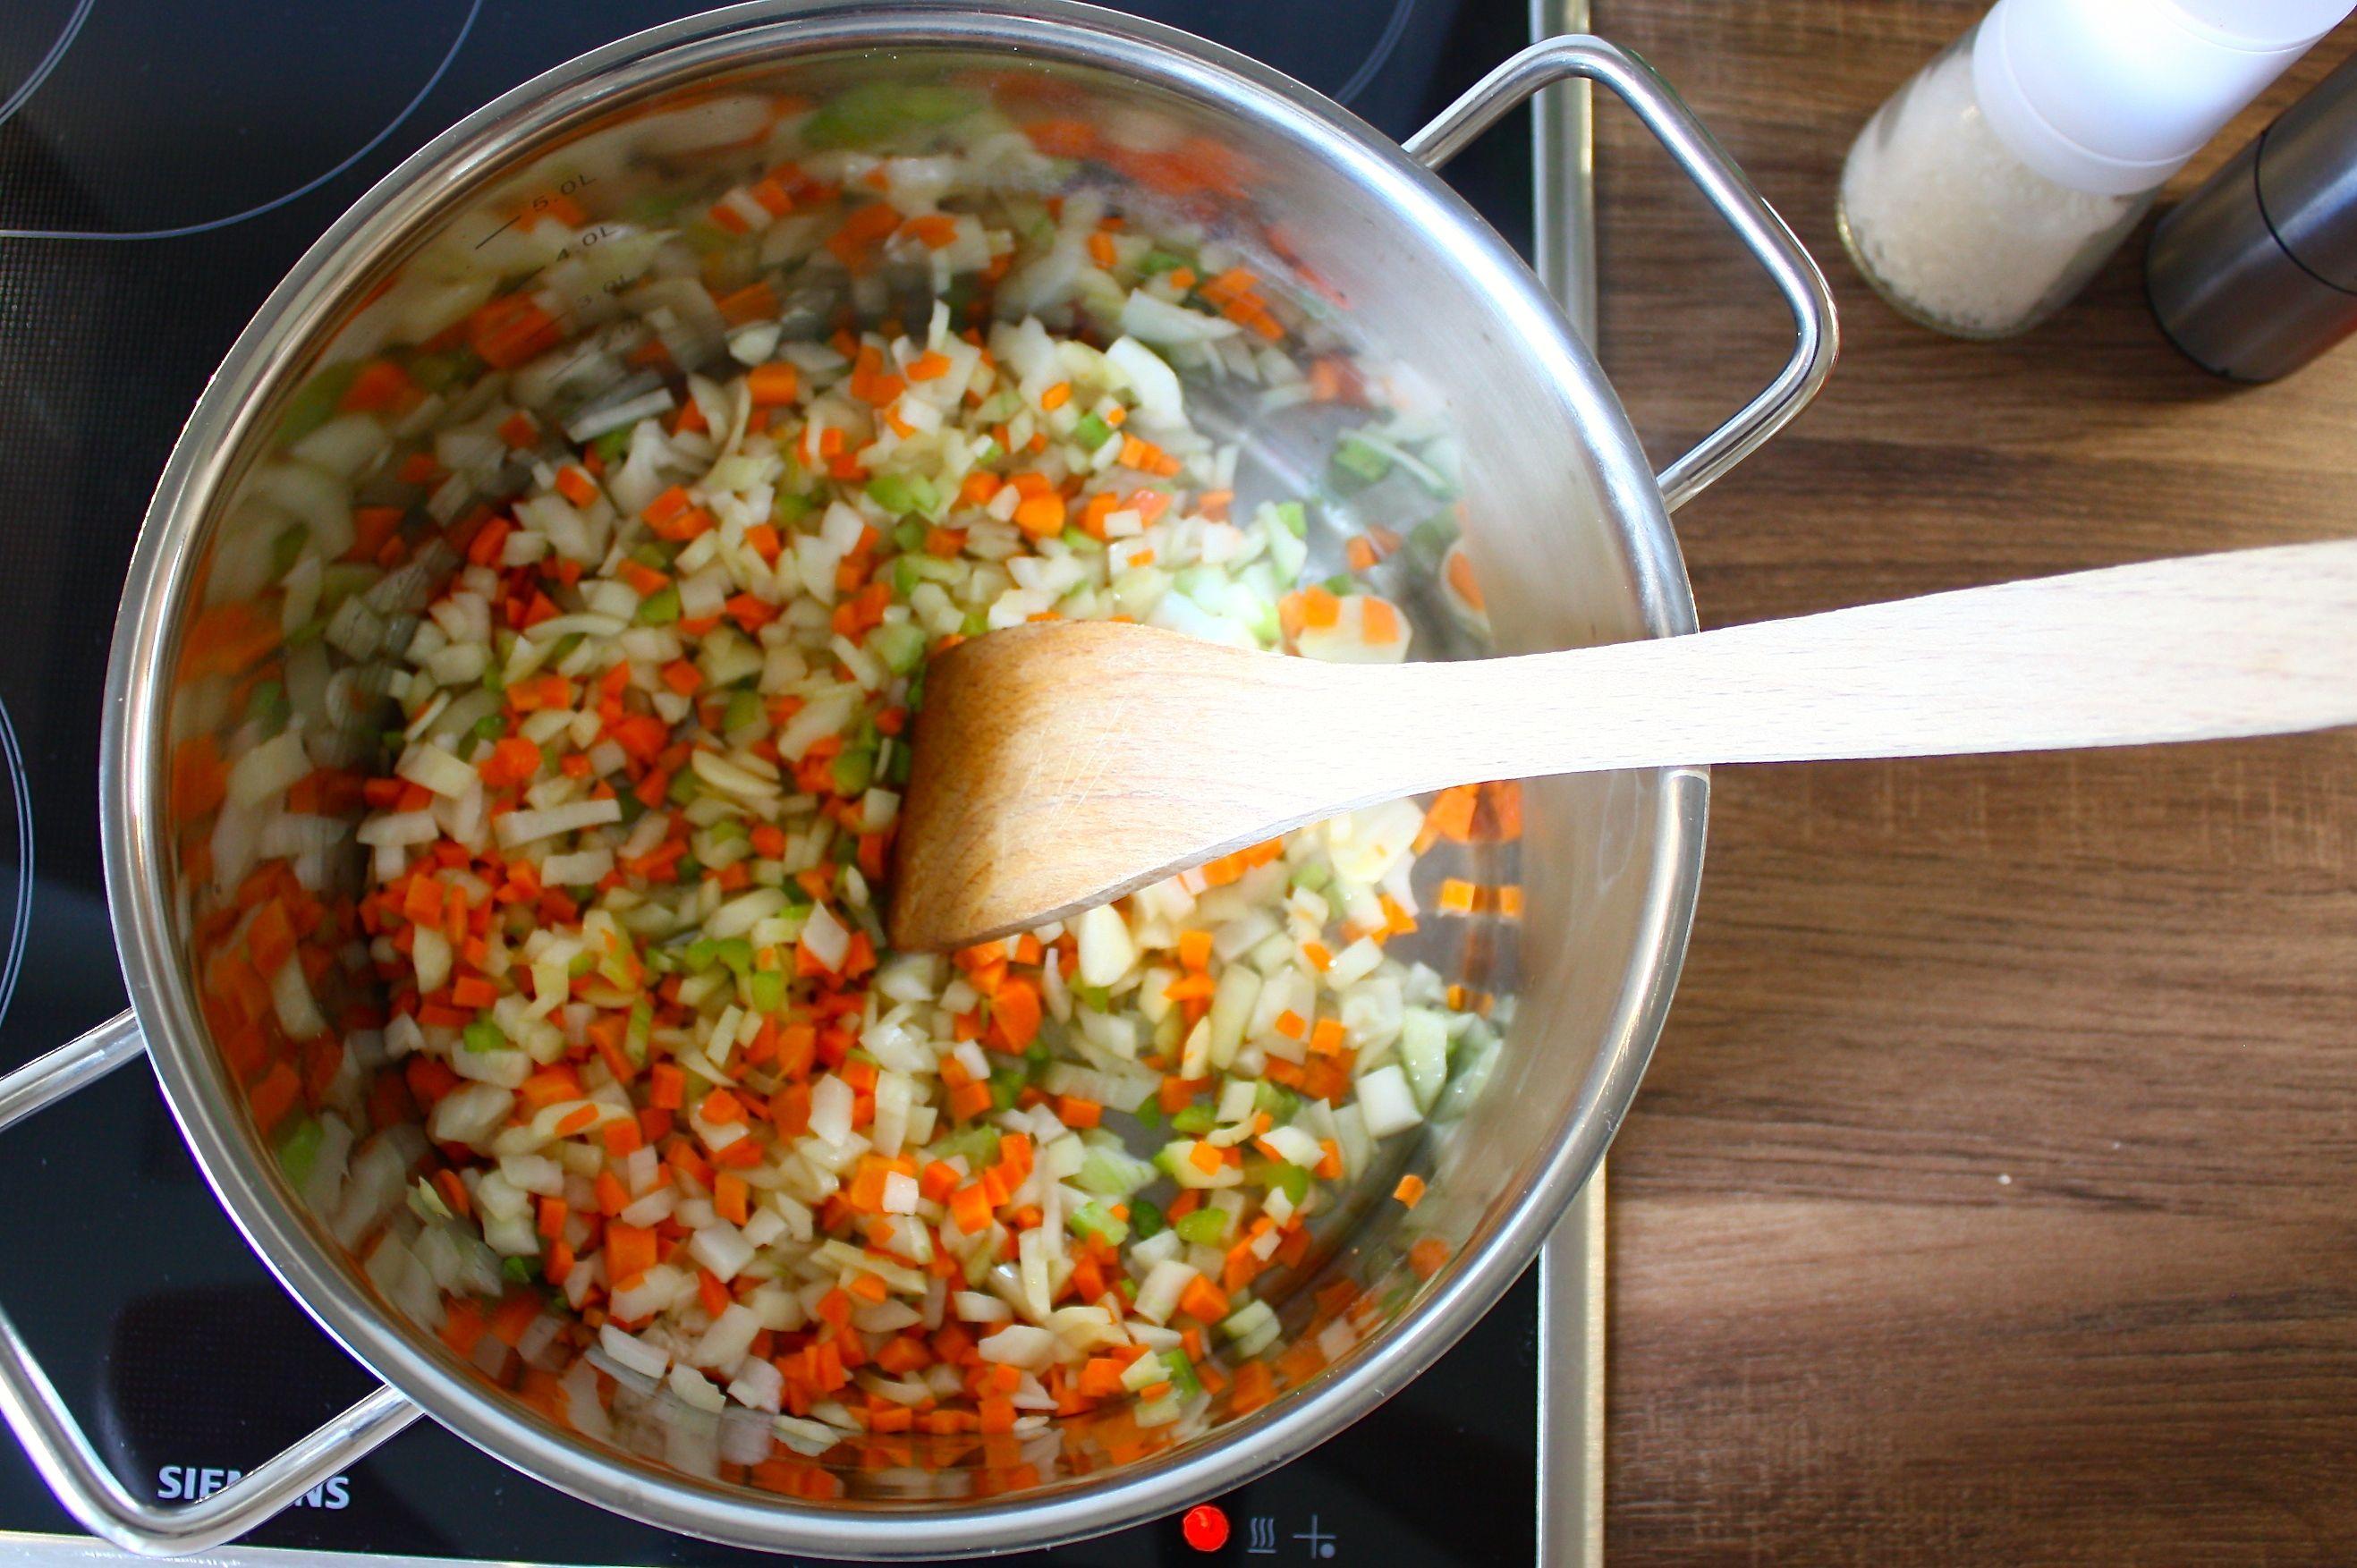 Gemüse im Topf für Spaghetti Bolognese